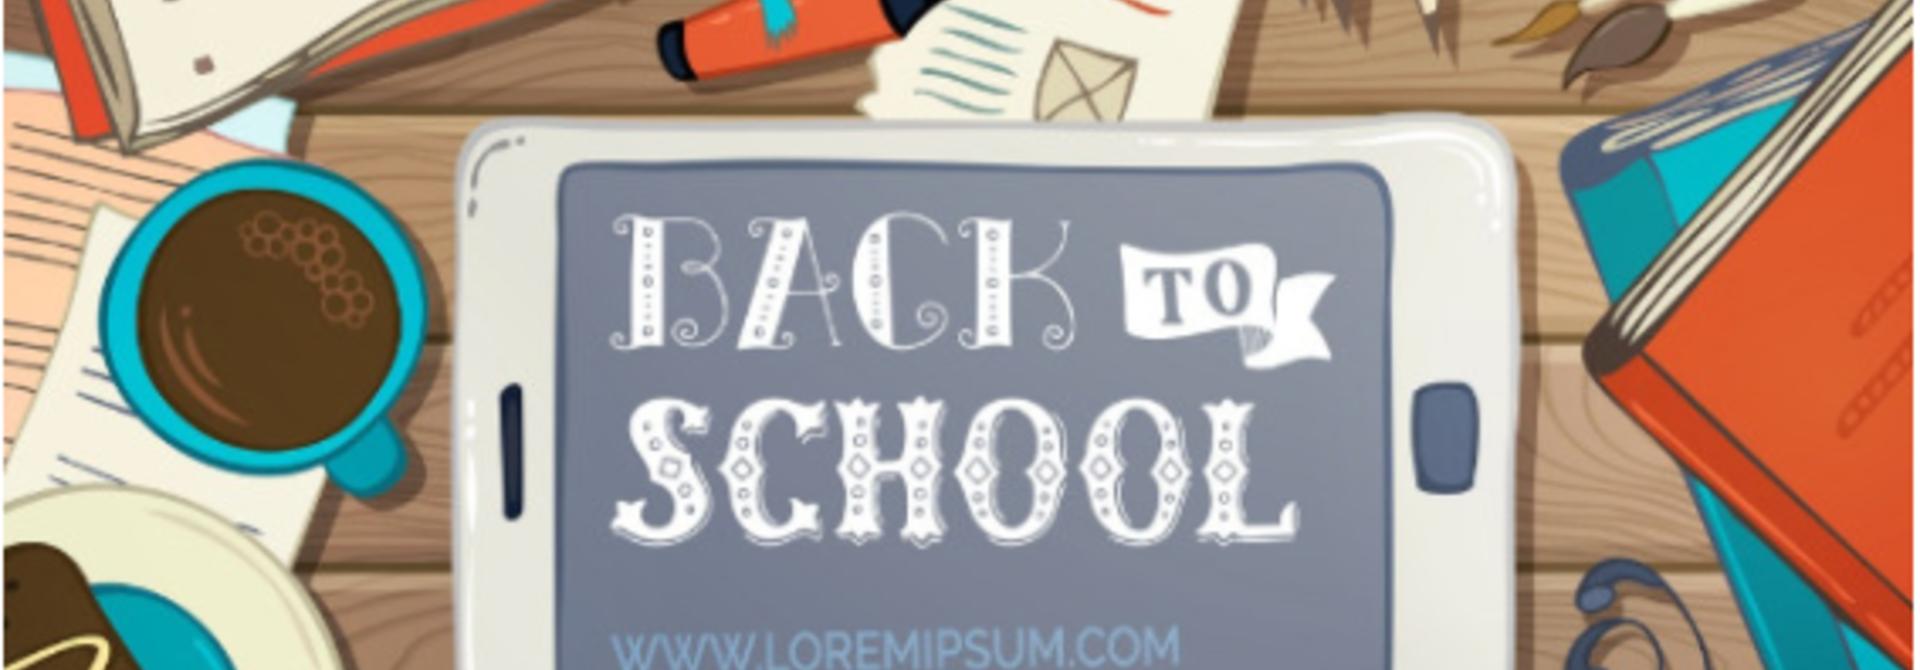 Back to school = 10% korting tot en met nu zondag!